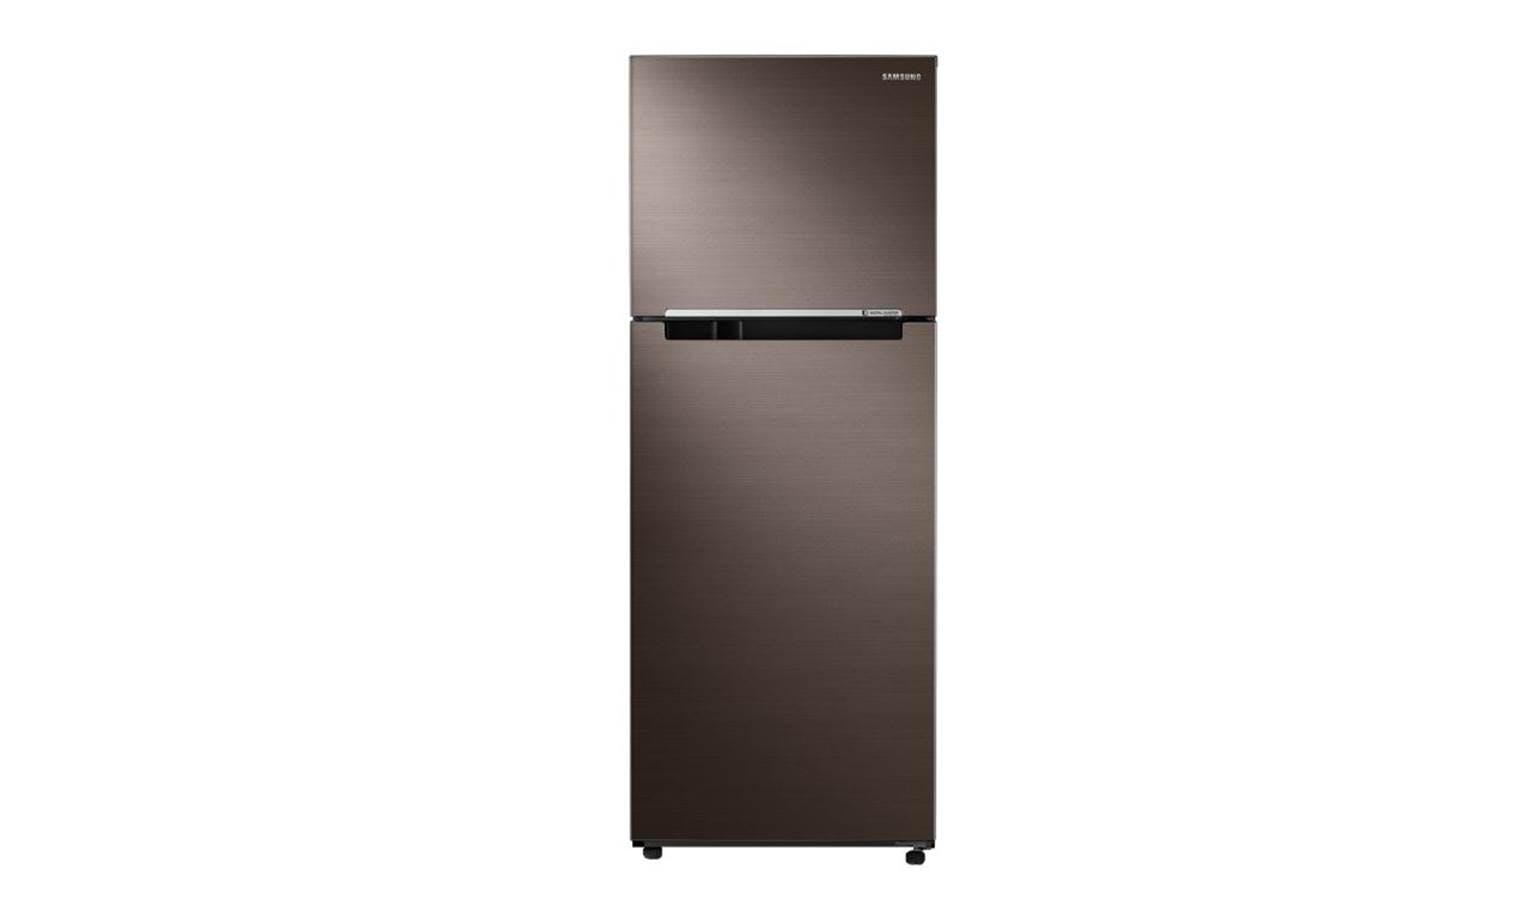 Samsung RT38K503ADX/SS 384L Top Freezer Refrigerator